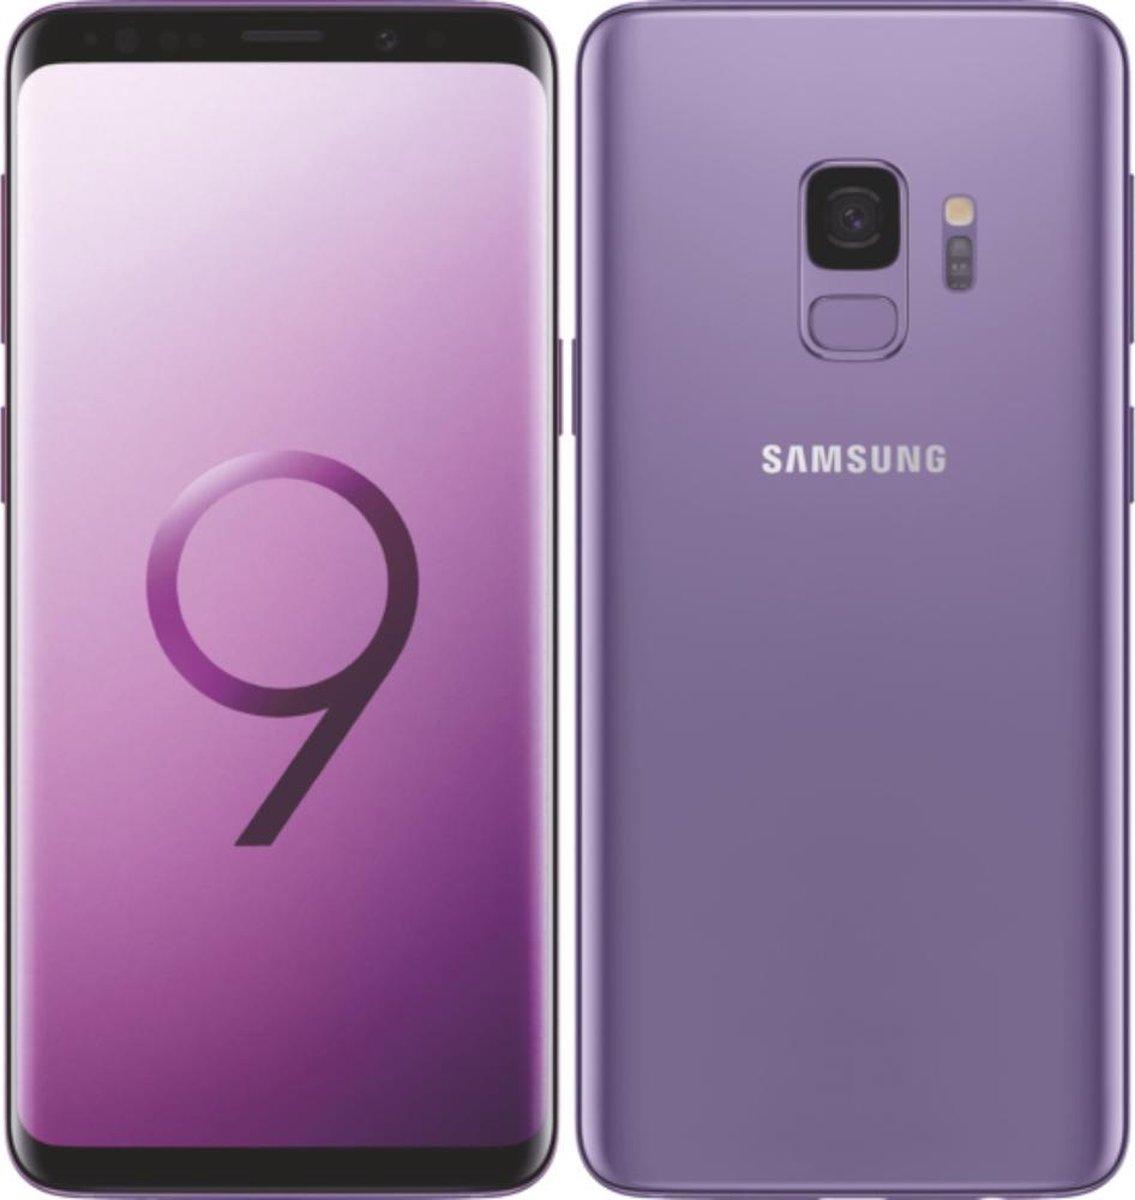 Samsung Galaxy S9+ Duo - Alloccaz Refurbished - B grade (Licht gebruikt) - 64GB - Ultra Violet